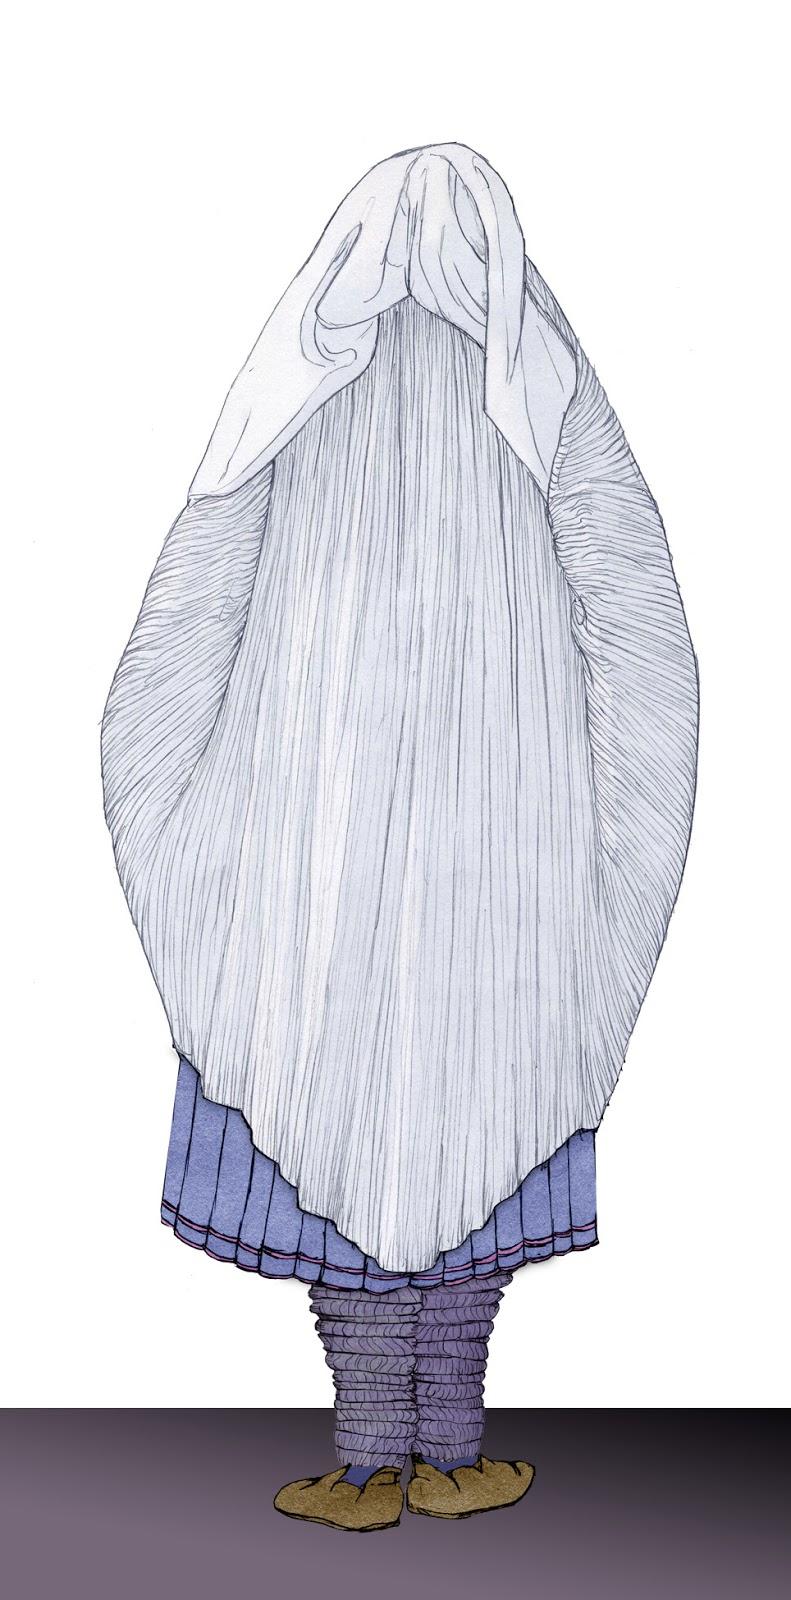 Morisca, sarracena, dibujo